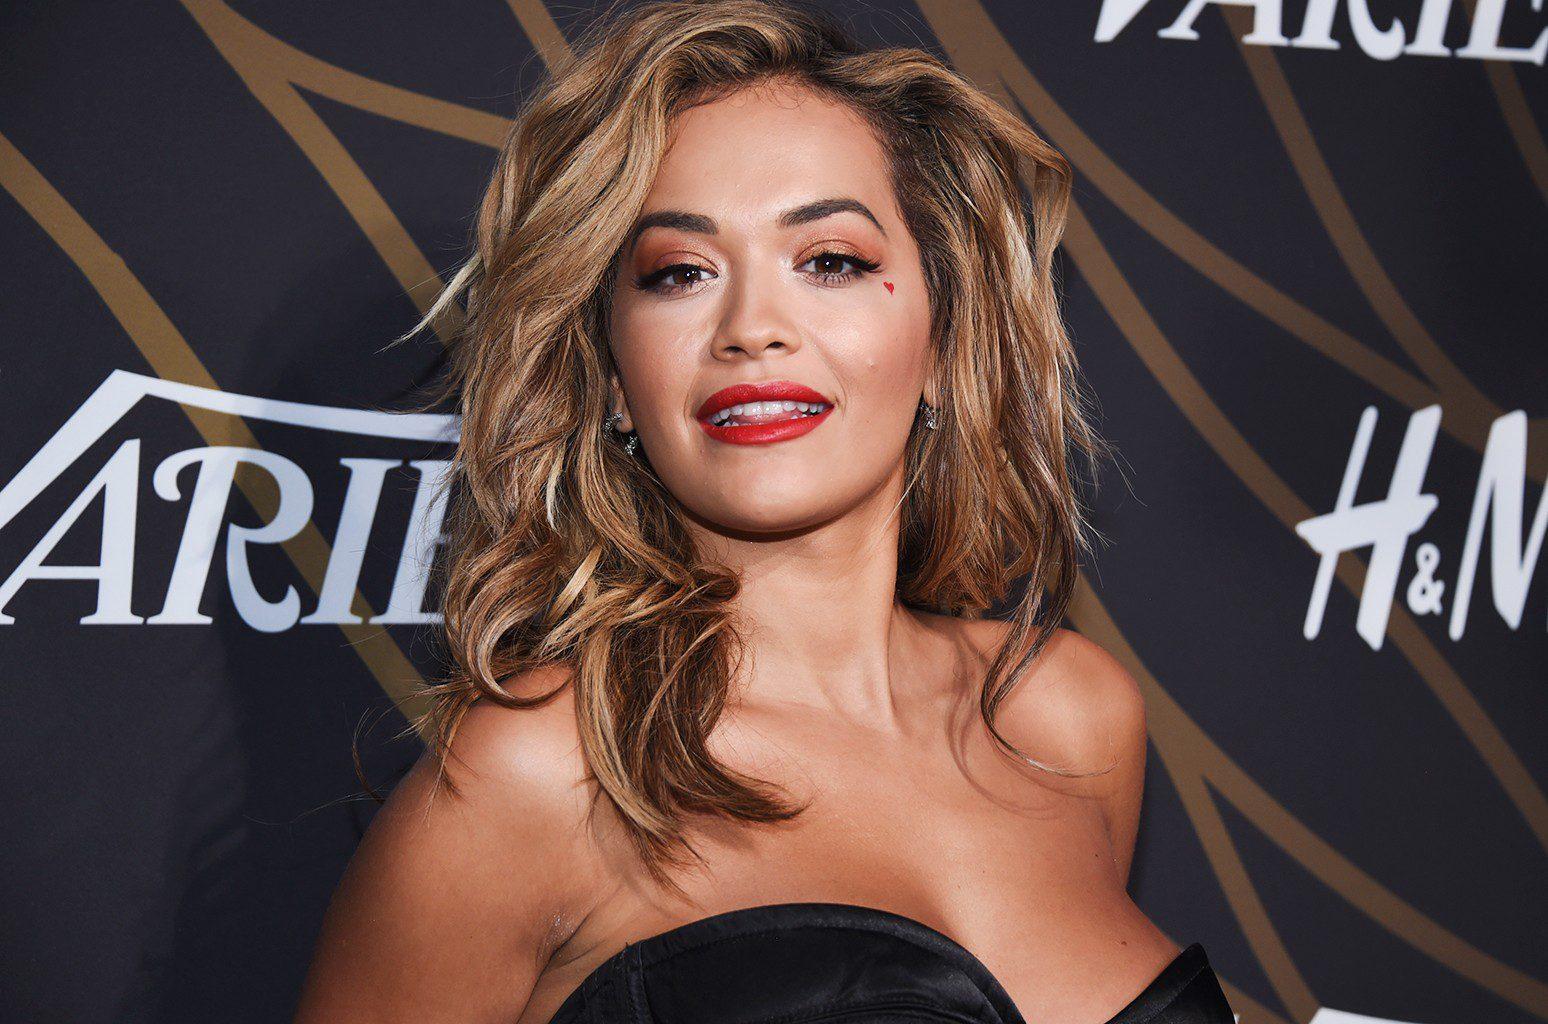 Rita Ora Net Worth